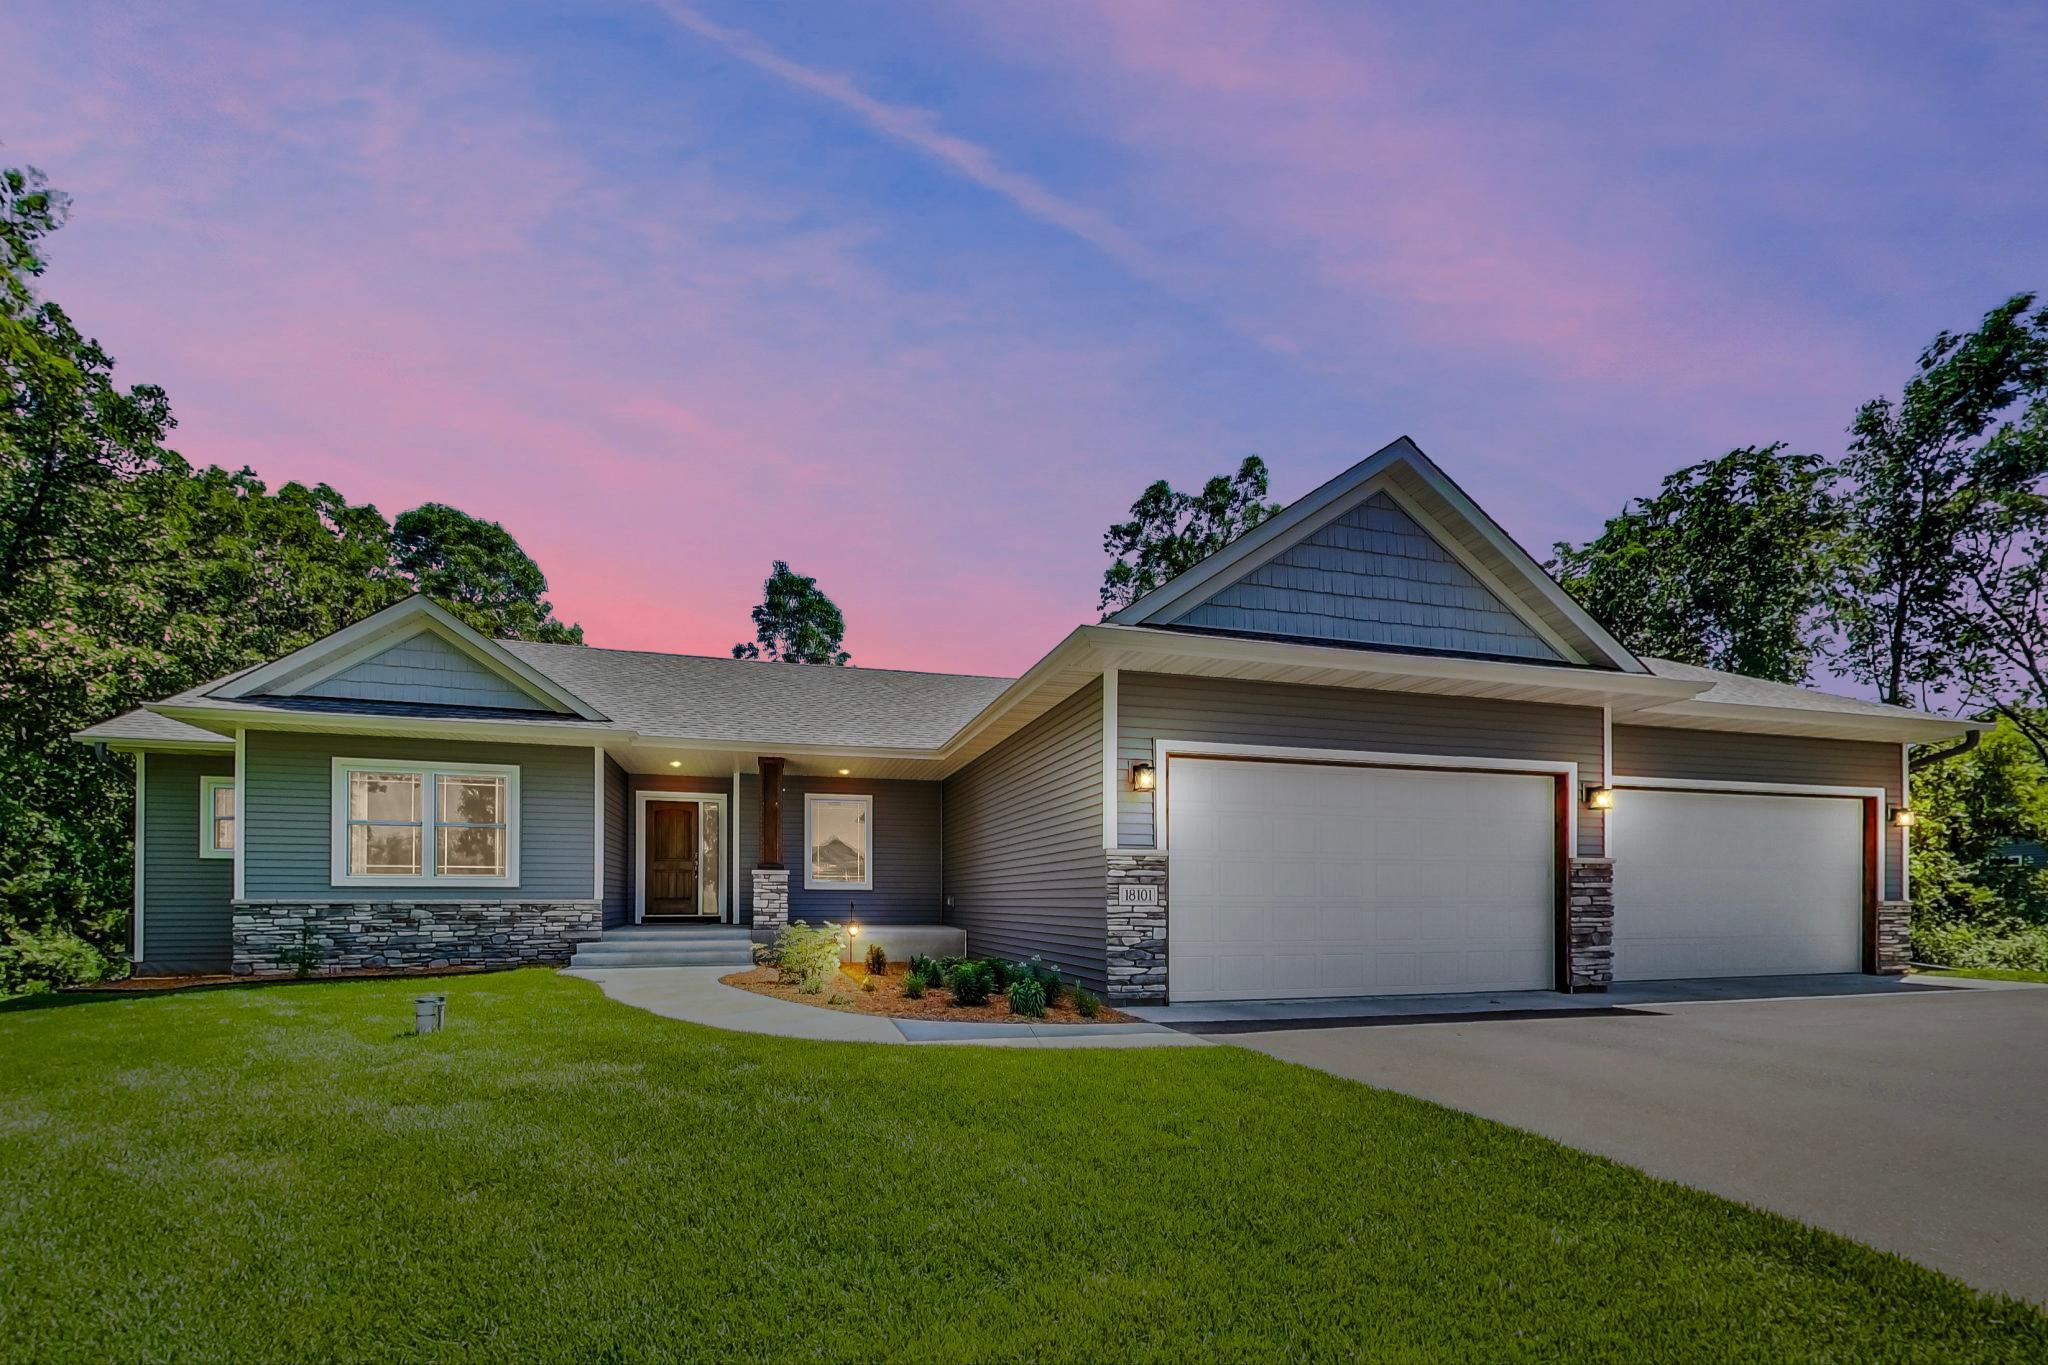 18101 224th Avenue NW Property Photo - Big Lake, MN real estate listing